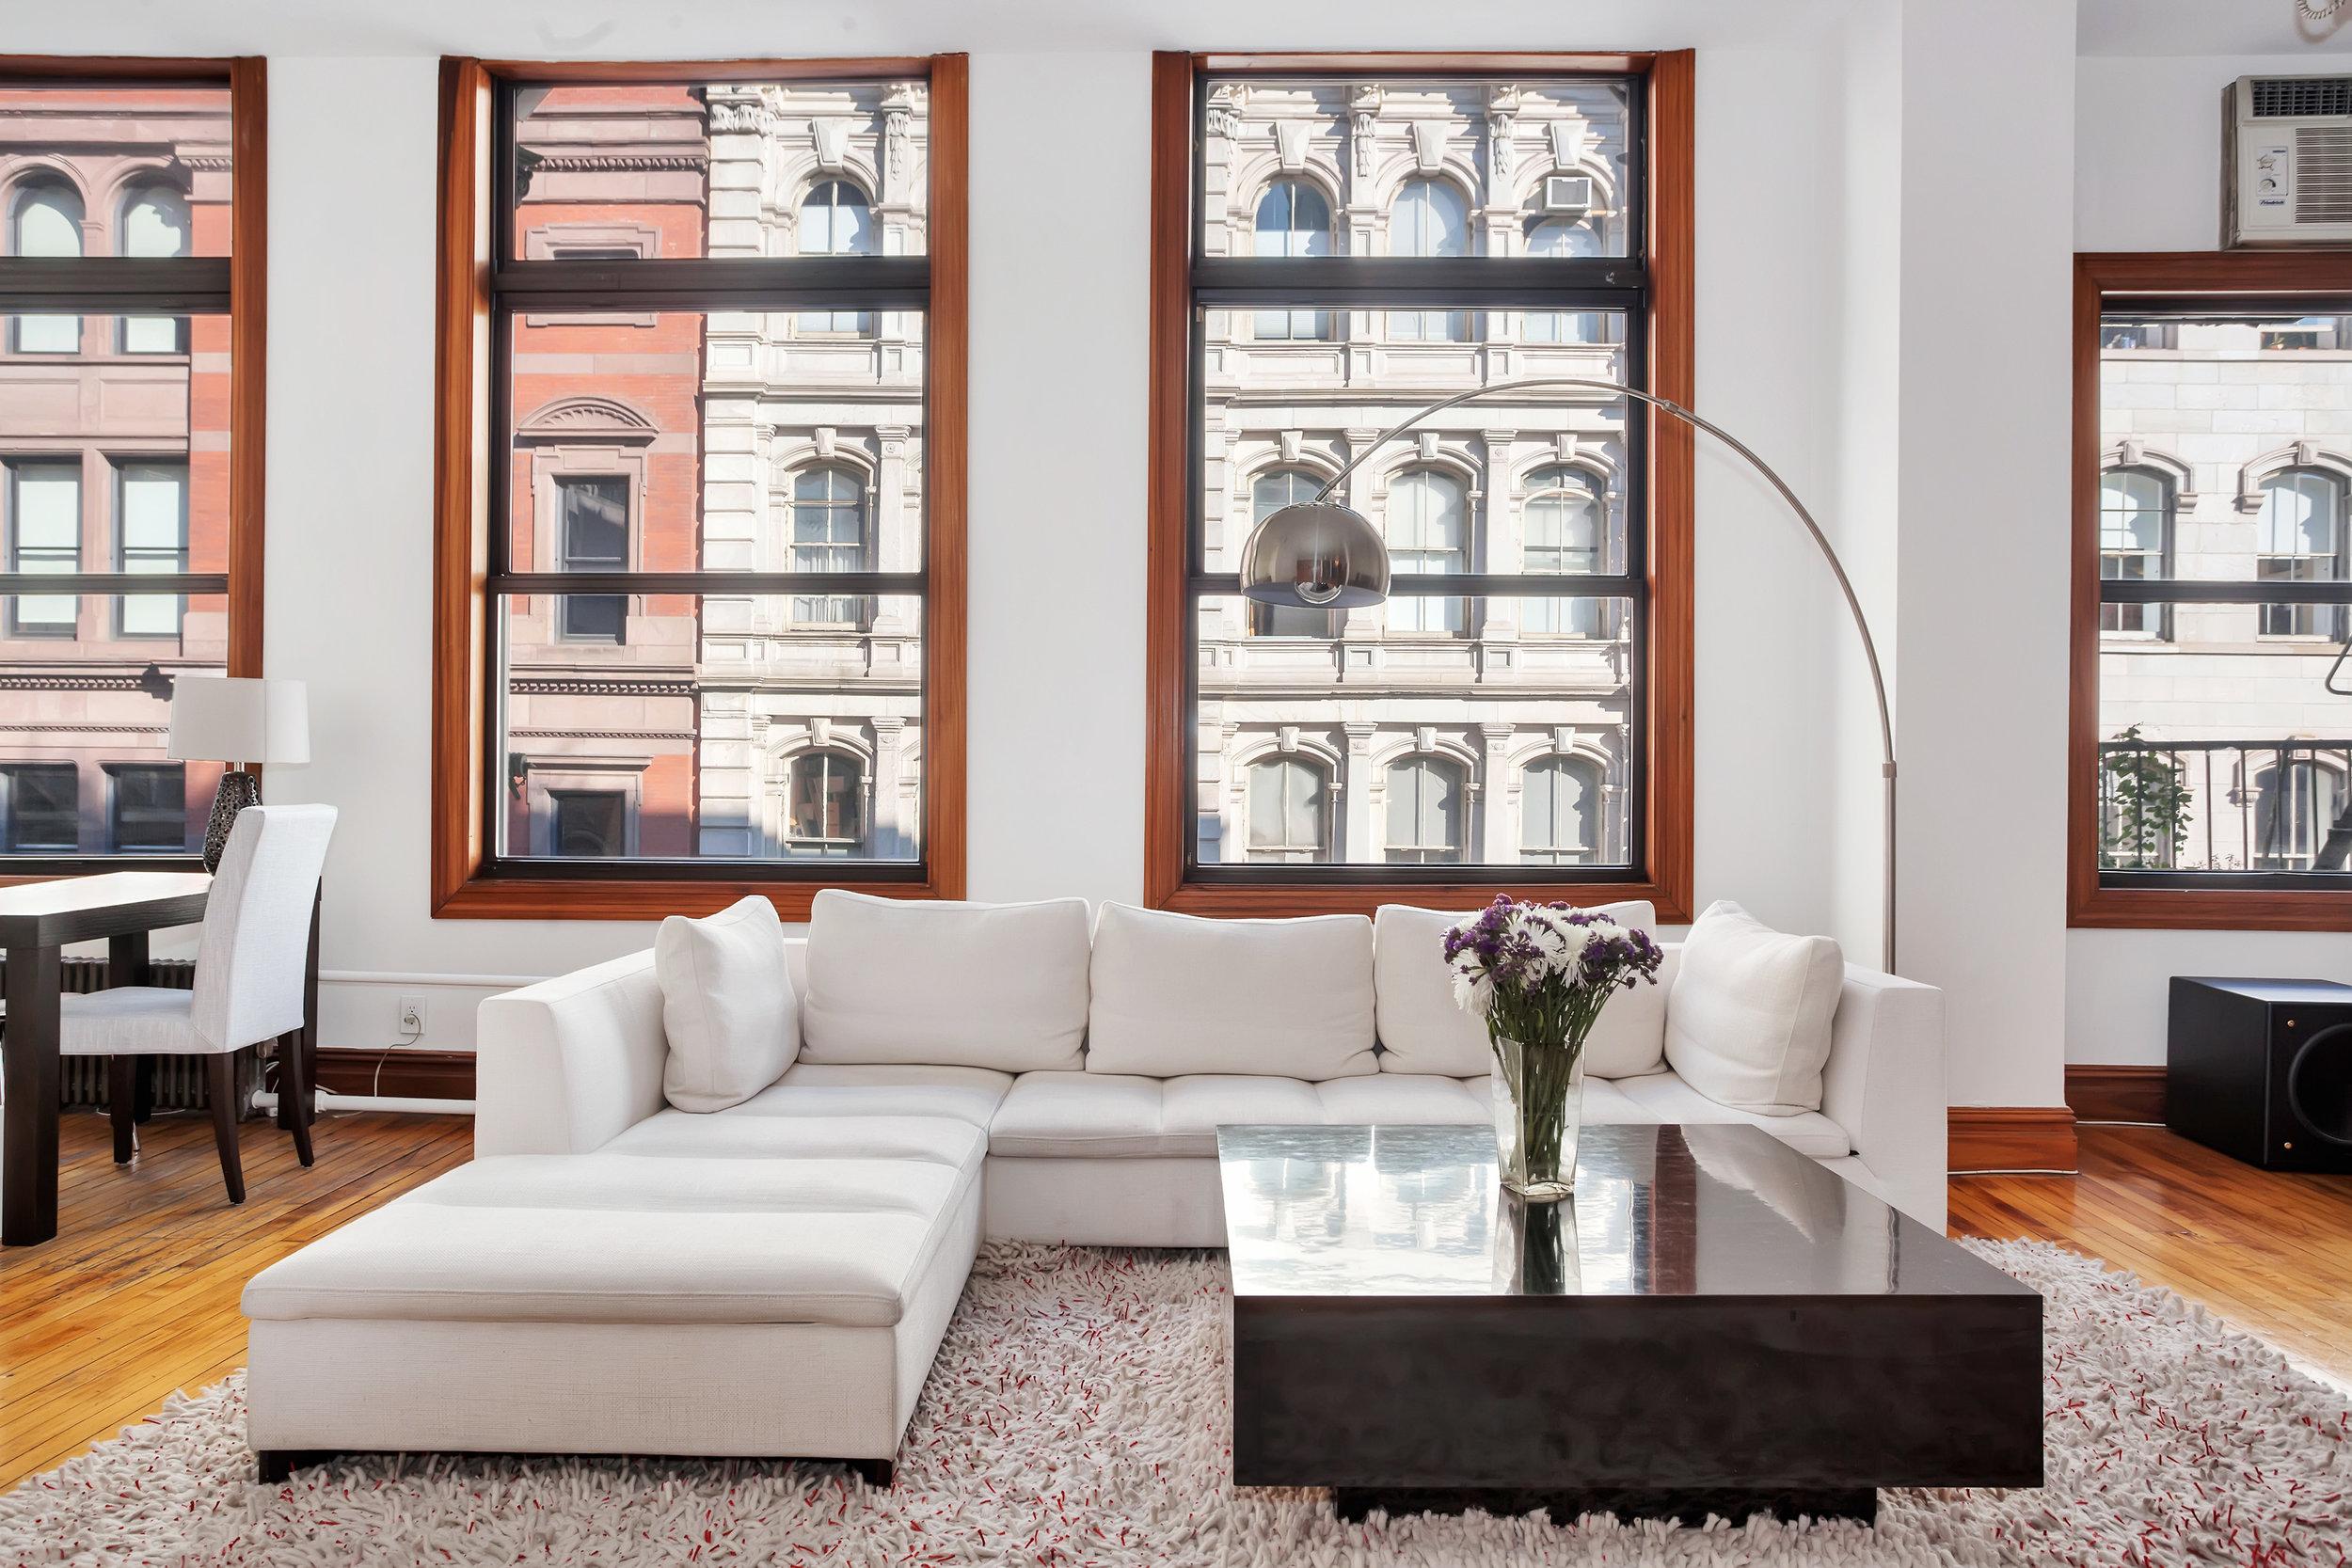 18 East 18th Street, 4th Floor - $3,000,000